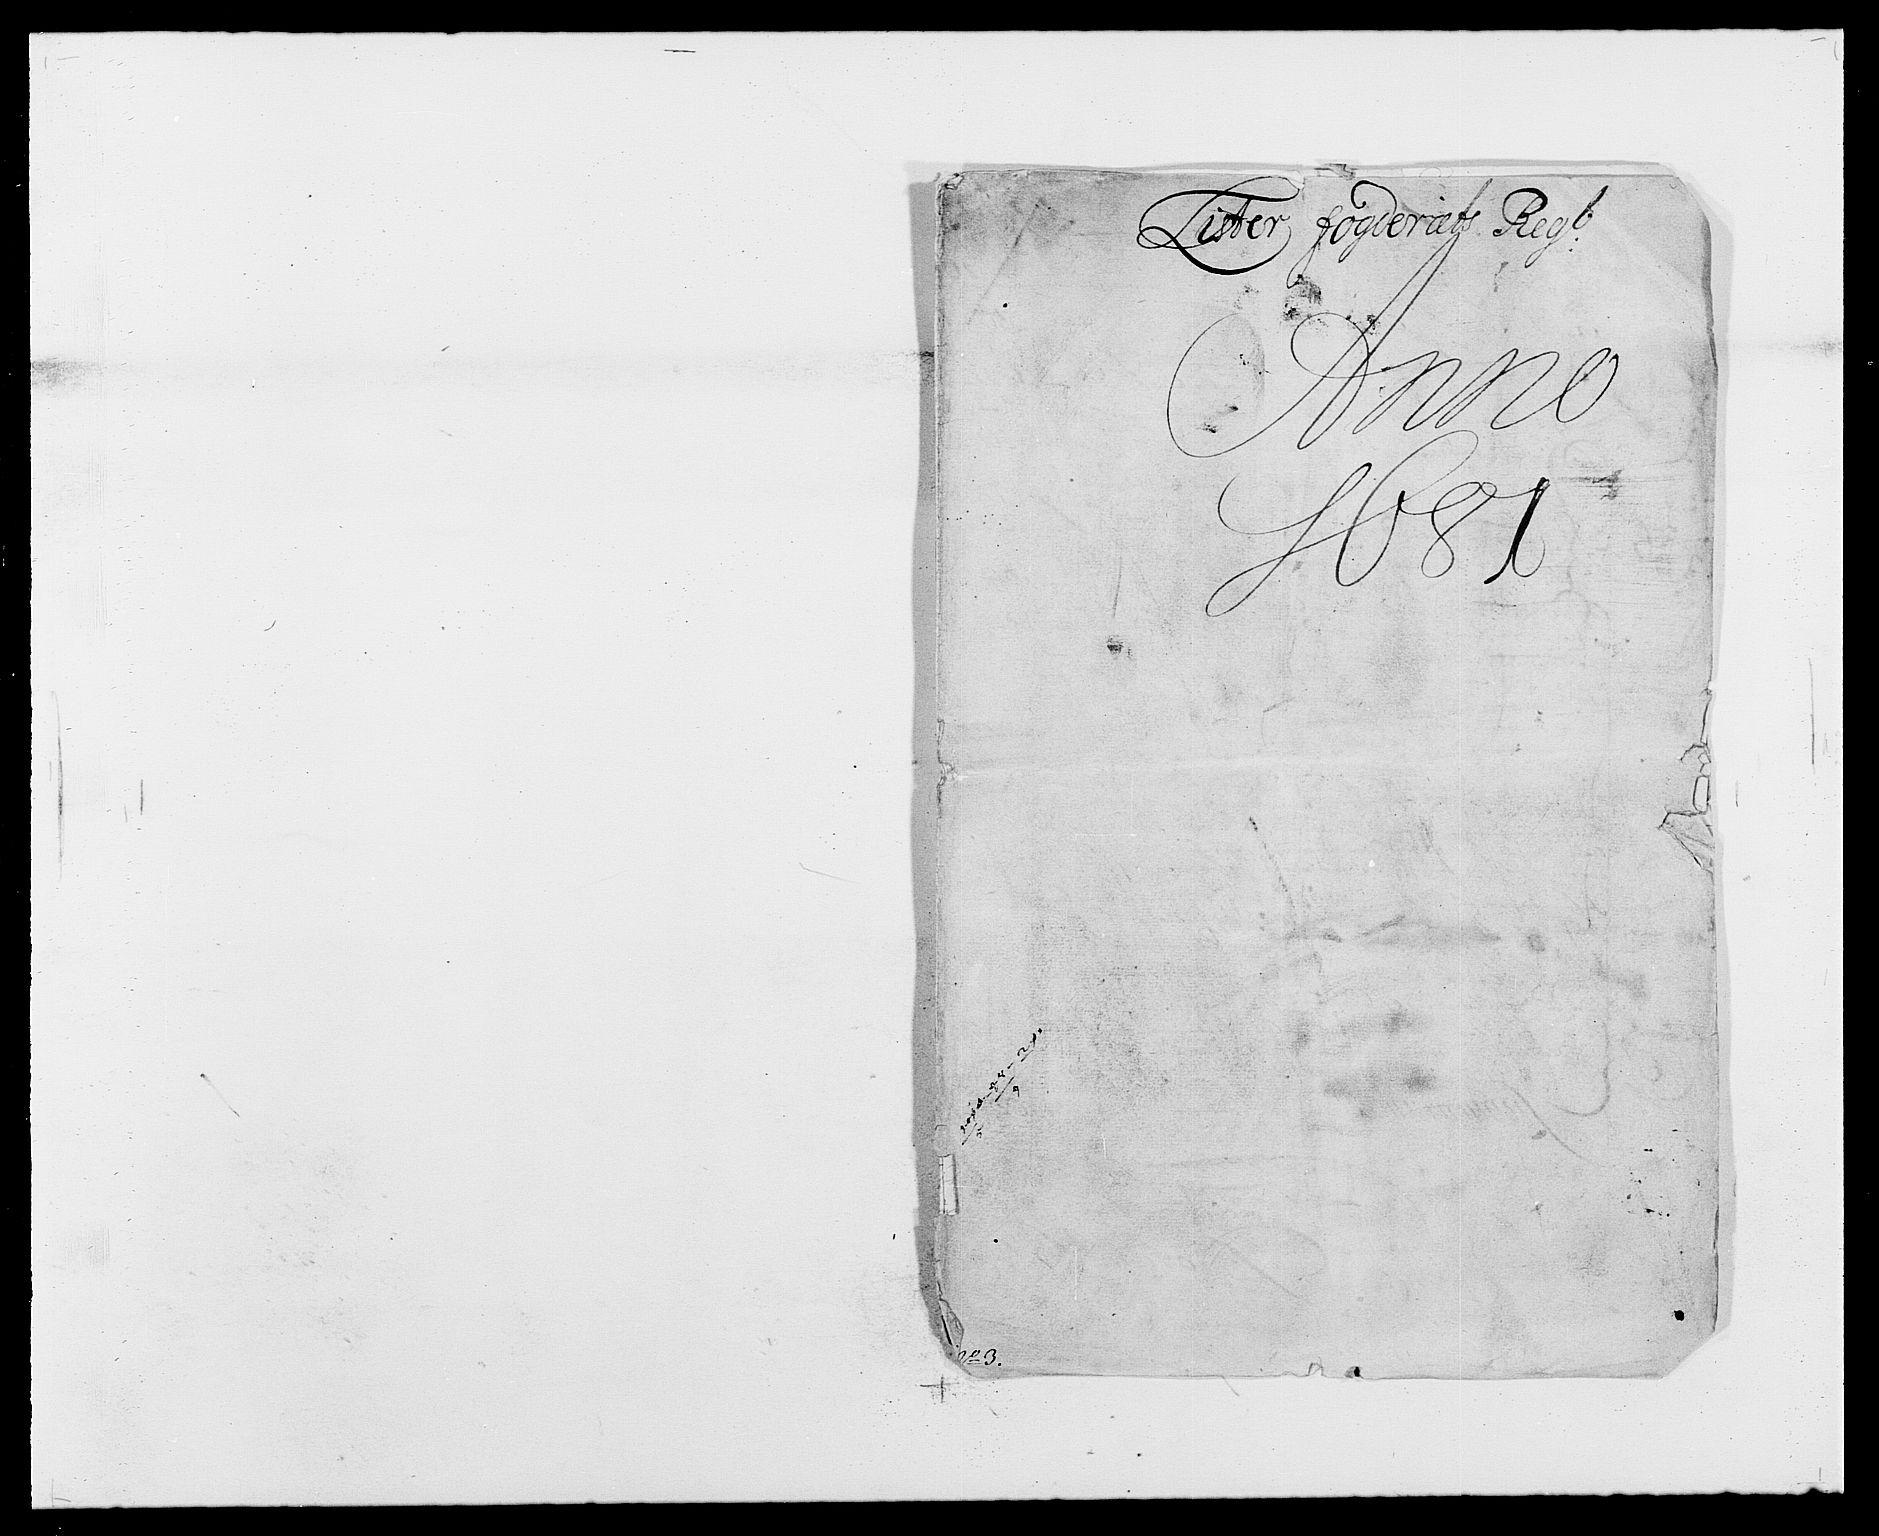 RA, Rentekammeret inntil 1814, Reviderte regnskaper, Fogderegnskap, R41/L2531: Fogderegnskap Lista, 1680-1682, s. 72